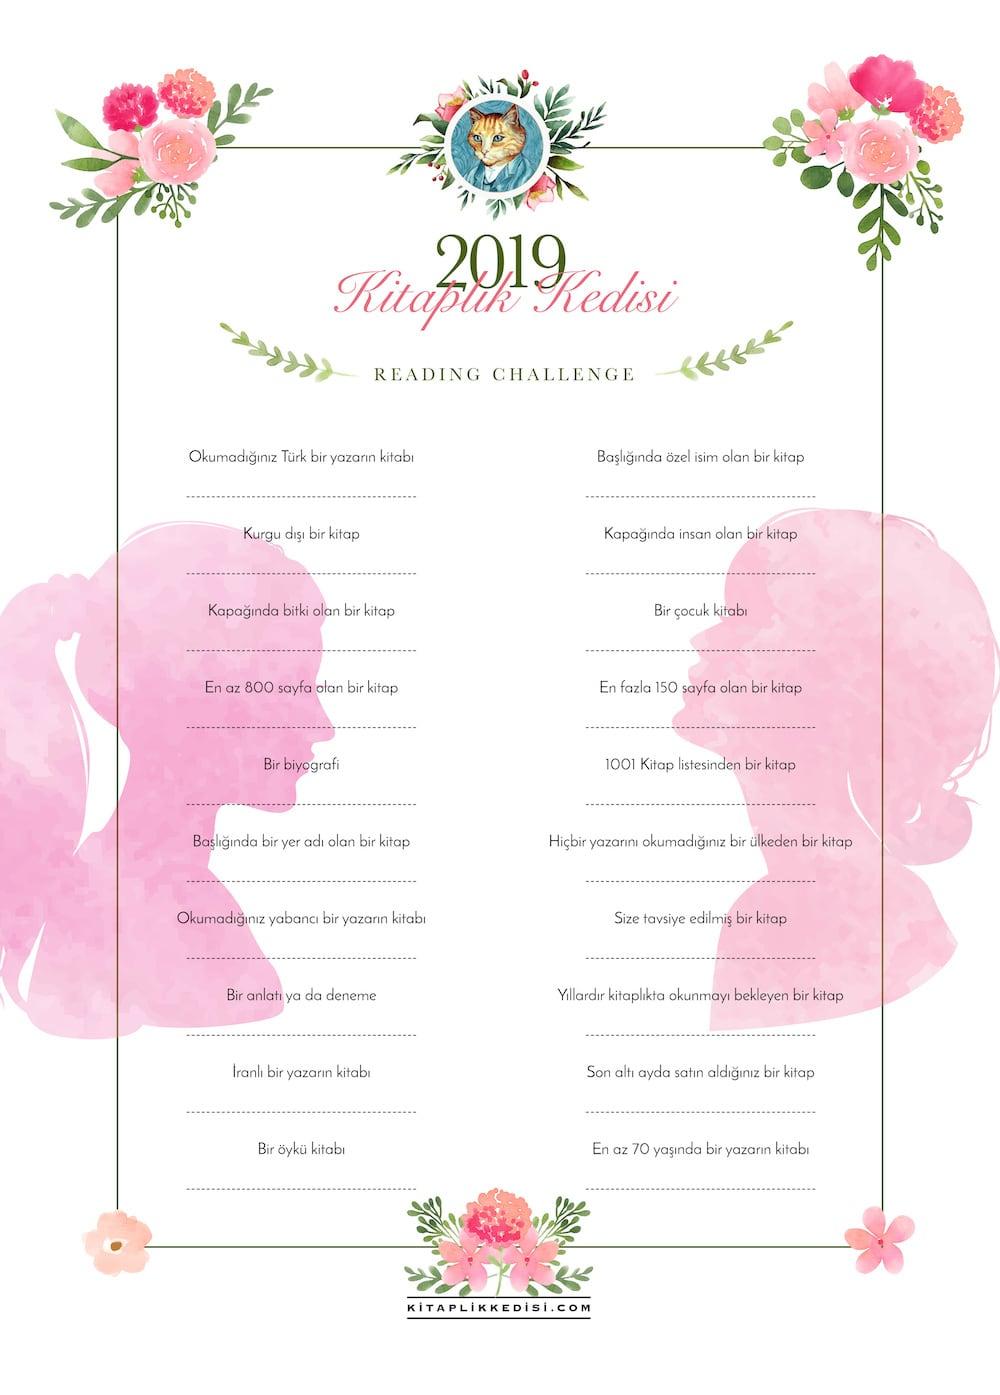 kitaplik kedisi reading challenge 2019 1